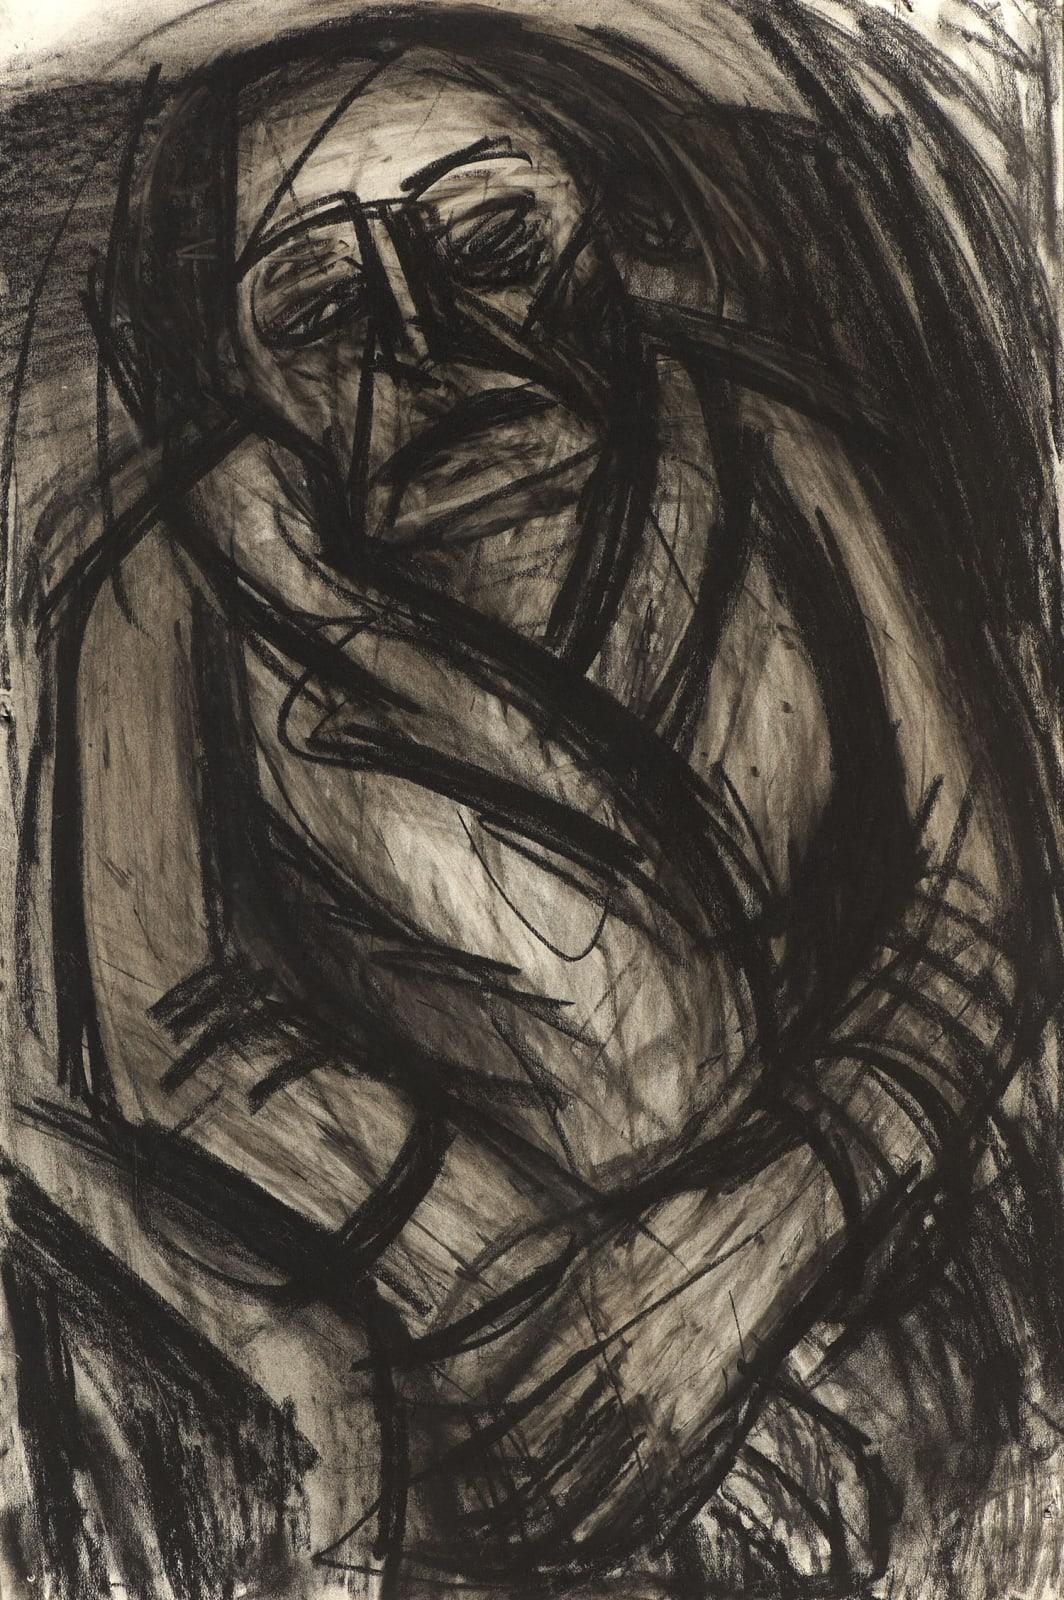 Leon Kossoff Portrait of N.M Seedo, c. 1957 Charcoal on paper 109 x 77cm. Ben Uri Collection